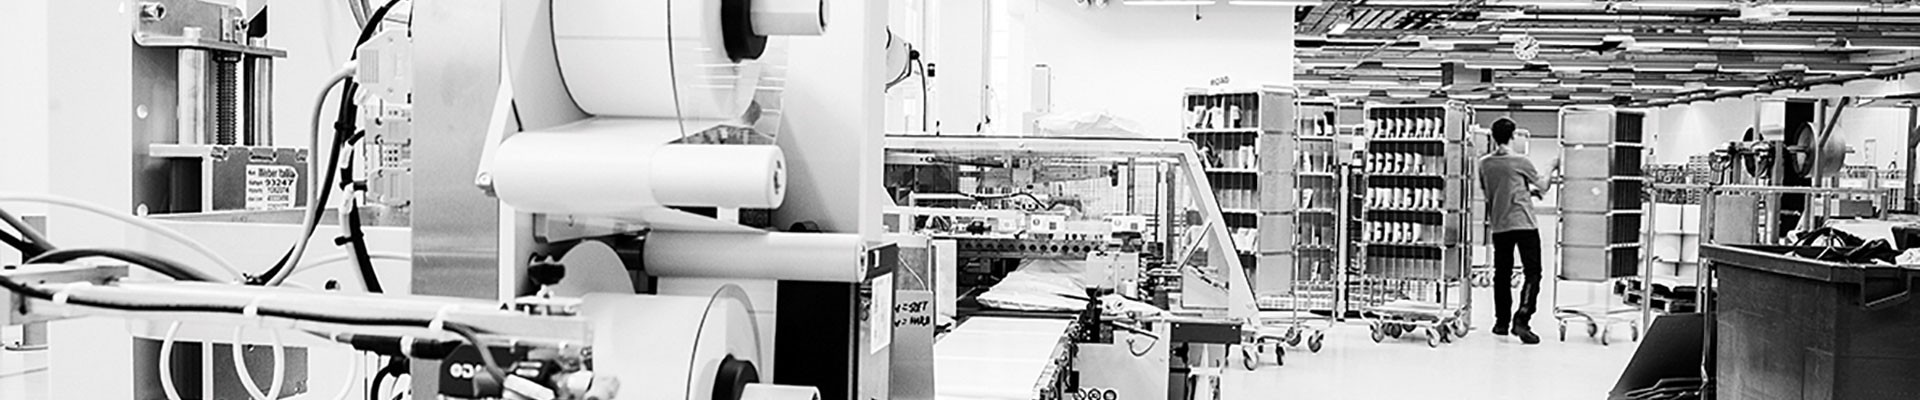 Axla Logistics produktion